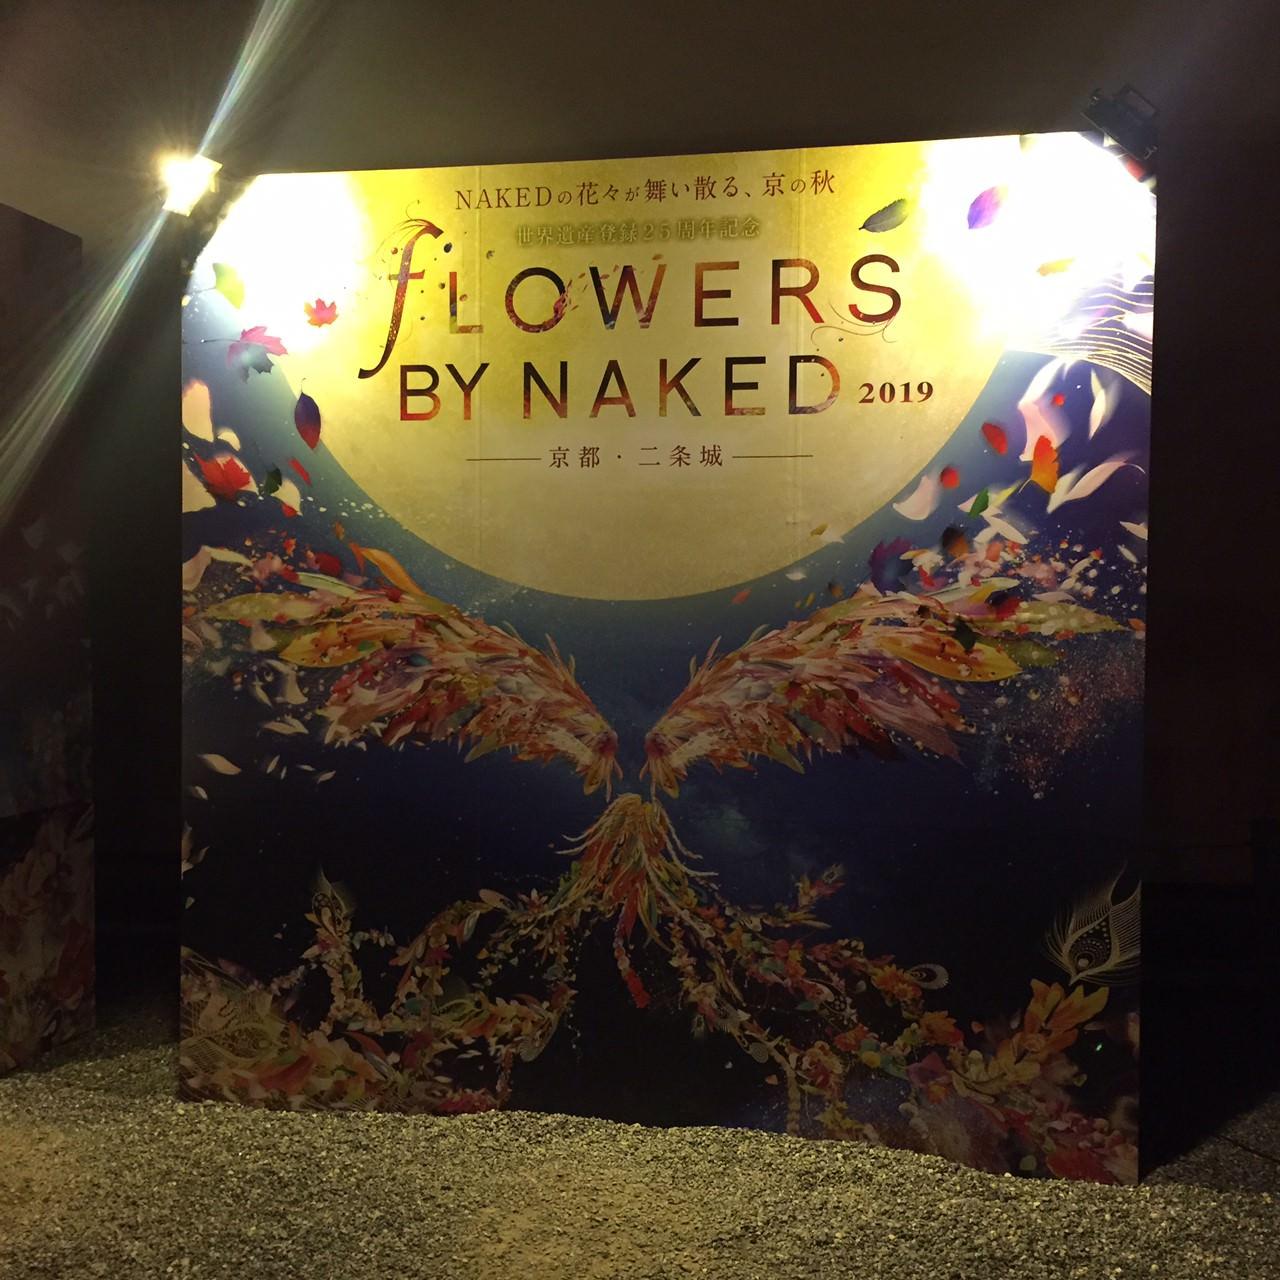 【Flowers By Naked 2019ー京都・二条城ー】世界遺産登錄25週年! - threeonelee.com